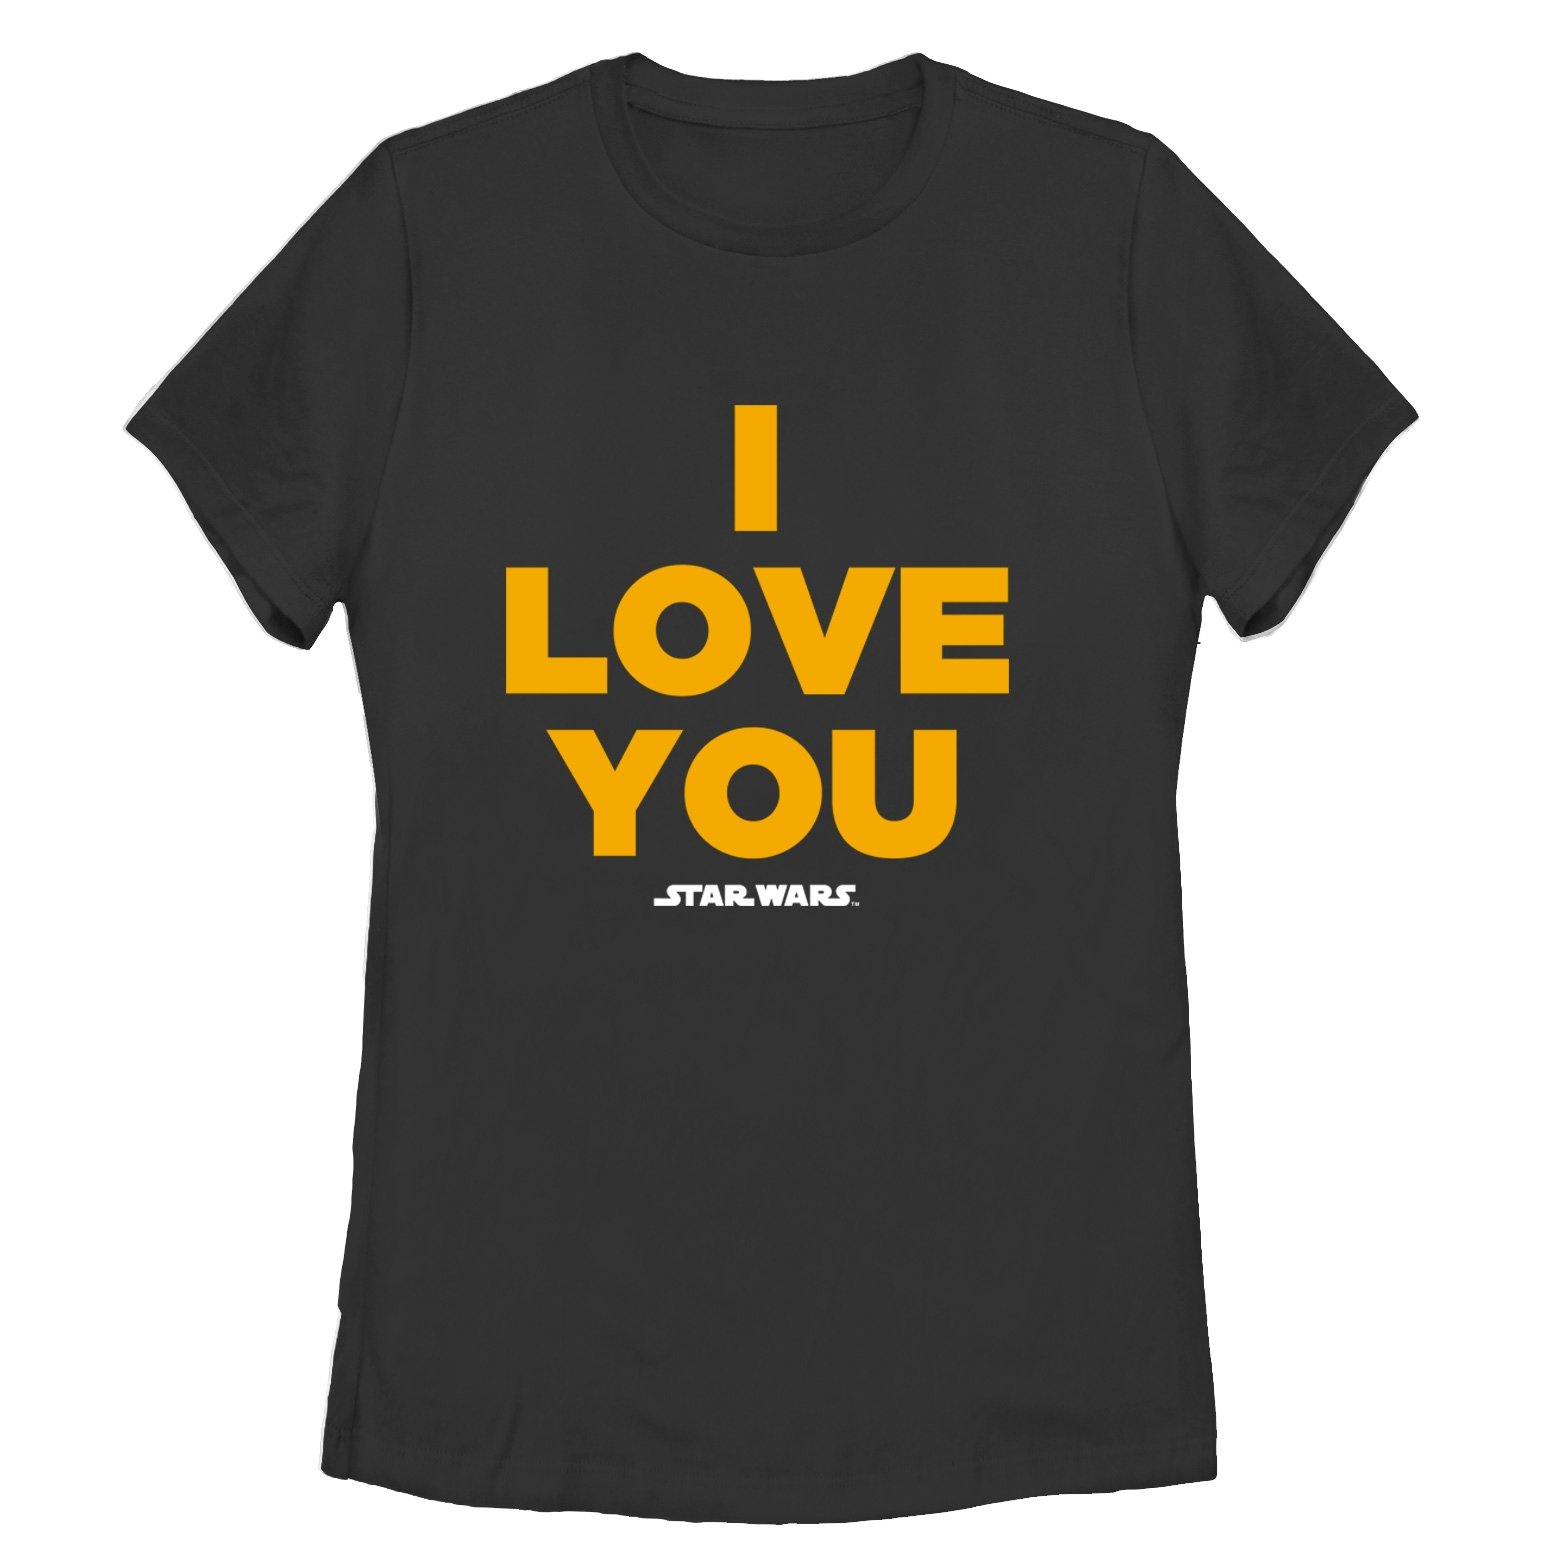 Star Wars Women's Princess Leia I Love You Black T-Shirt